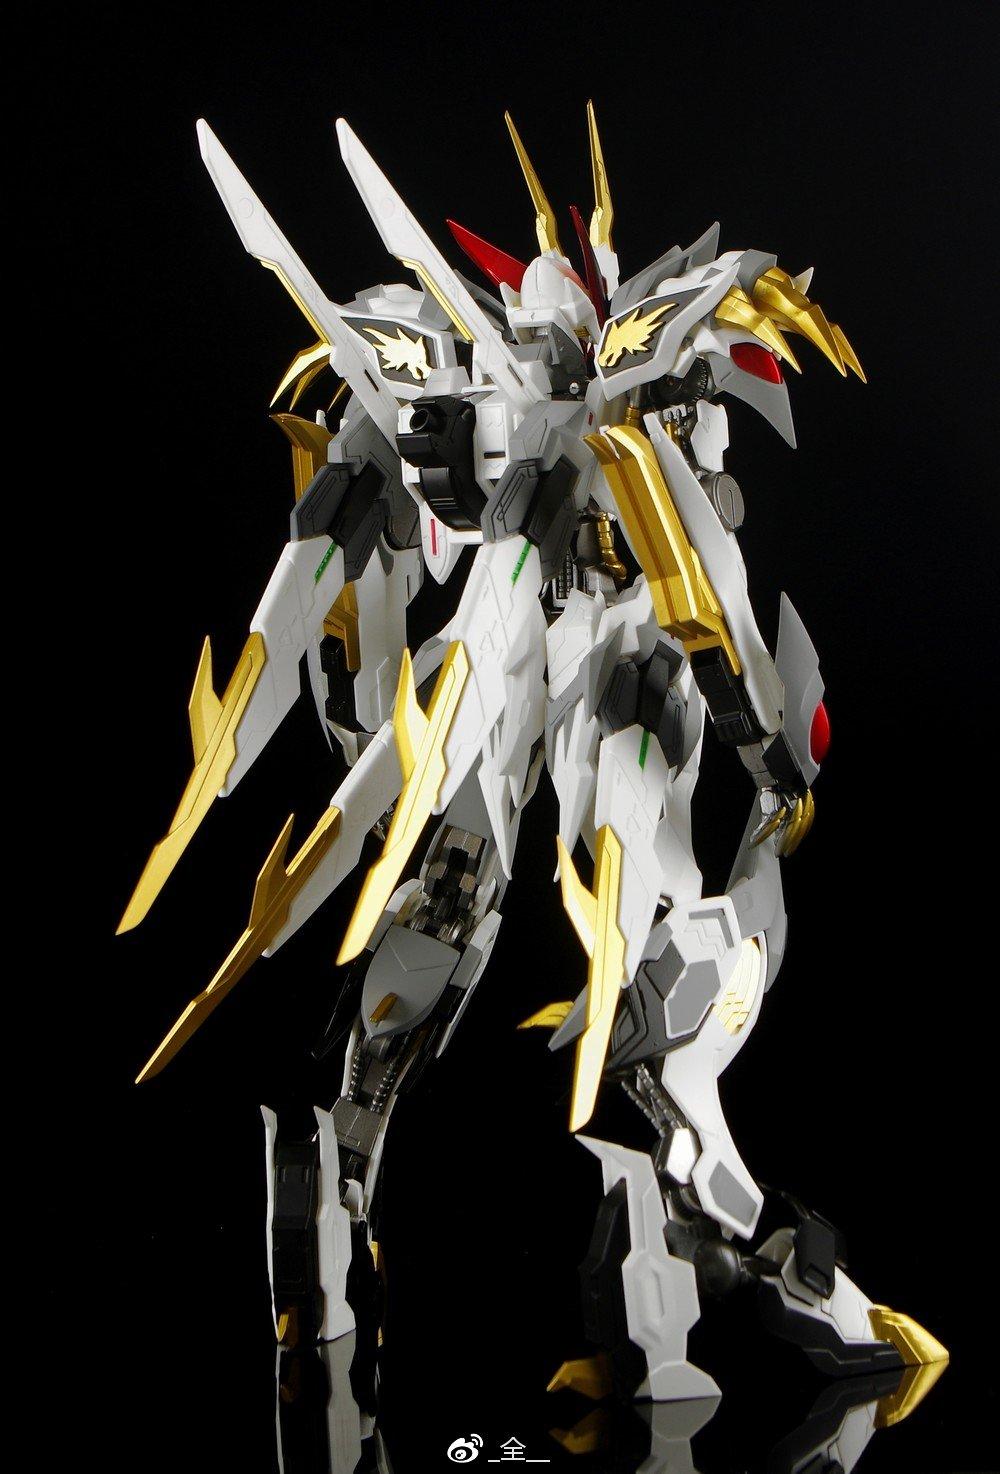 S279_MetalMyth_ryuou_inask_011.jpg